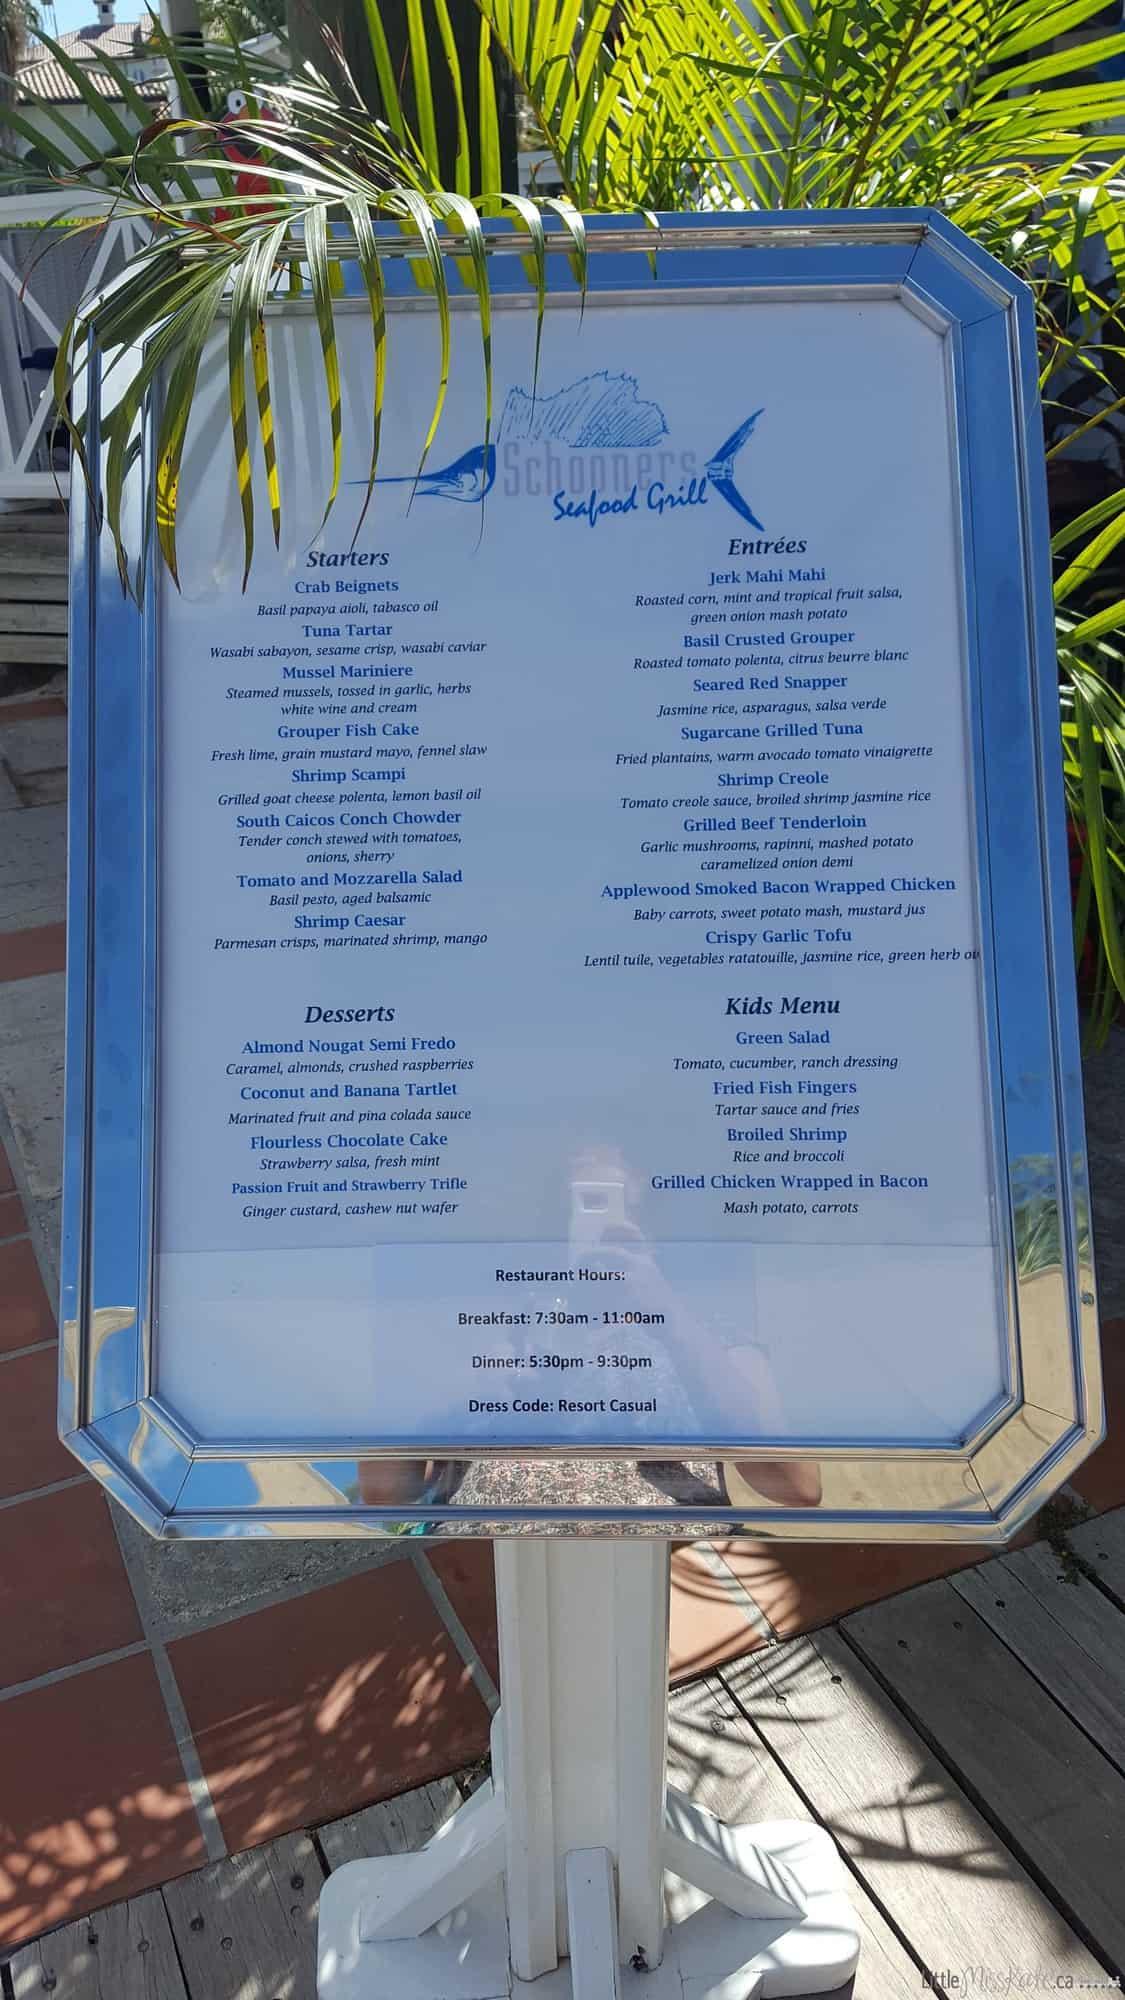 Beaches Resort Villages Turks and Caicos Restaurants - Schonners via littlemisskate.ca